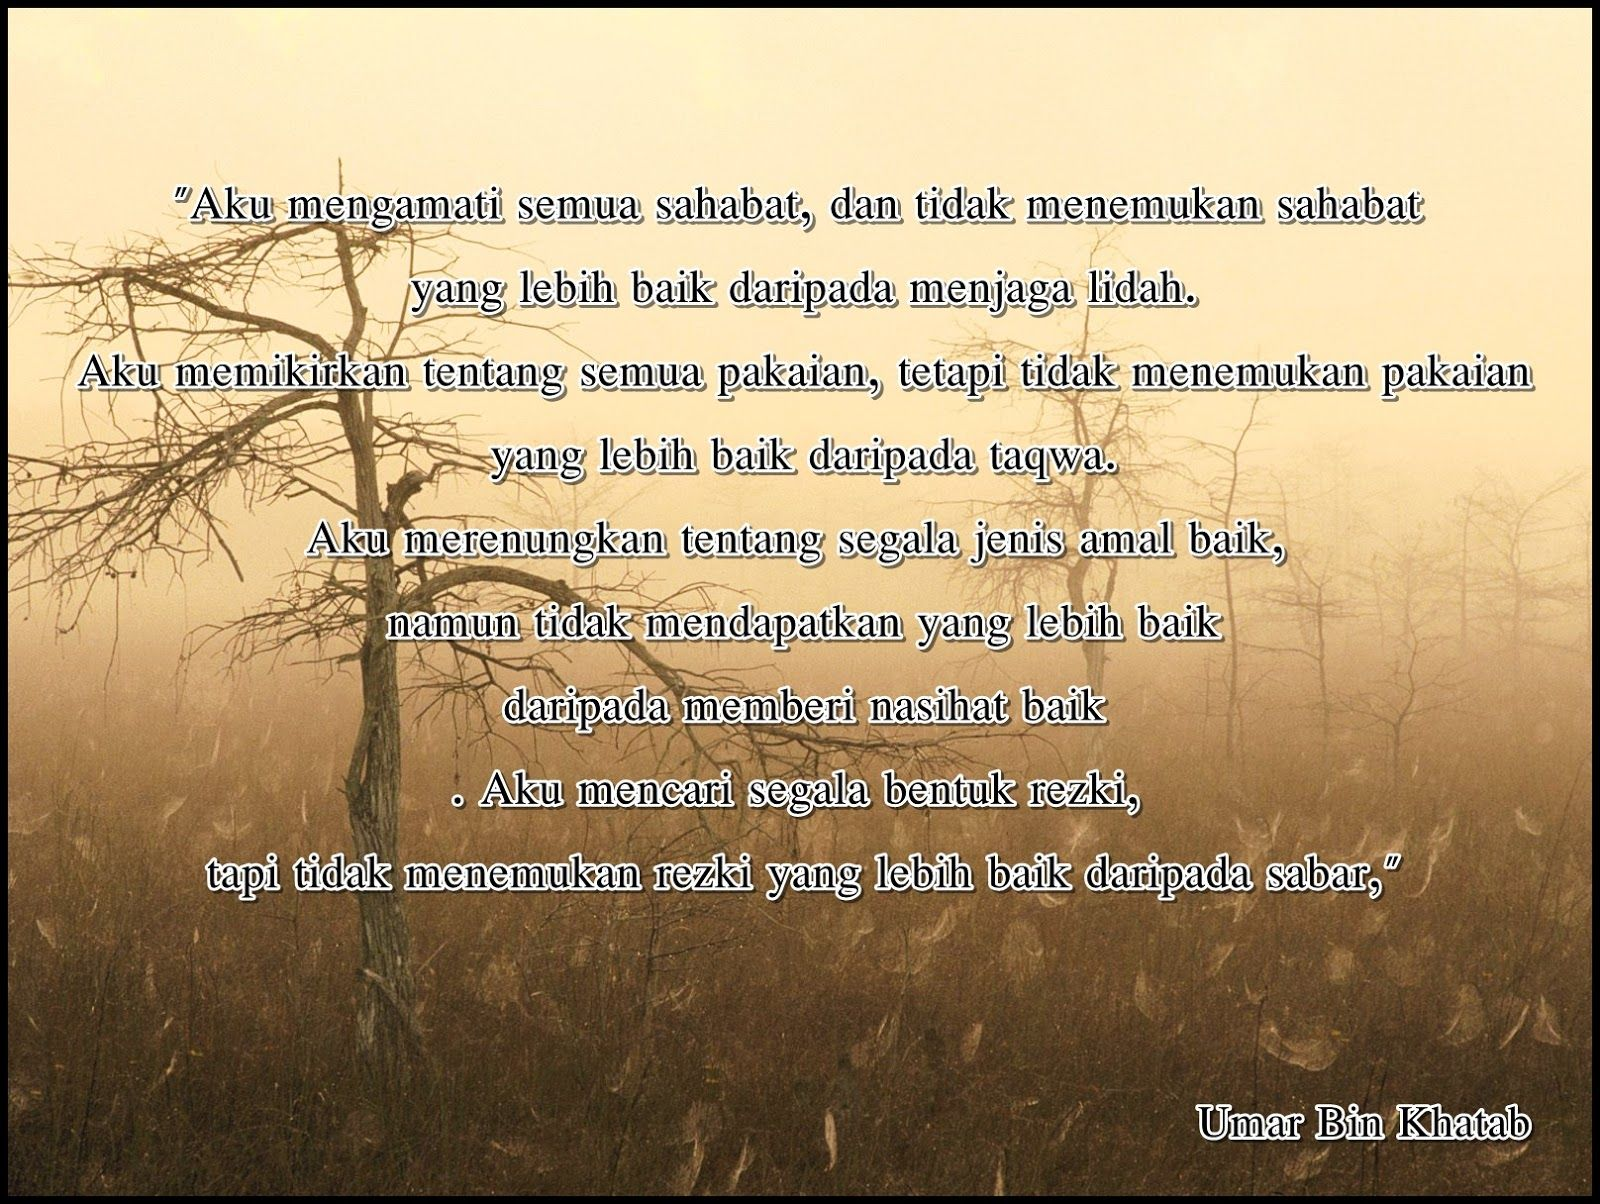 Kata Kata Mutiara Bijak Umar Bin Khatab Jdsk Dengan